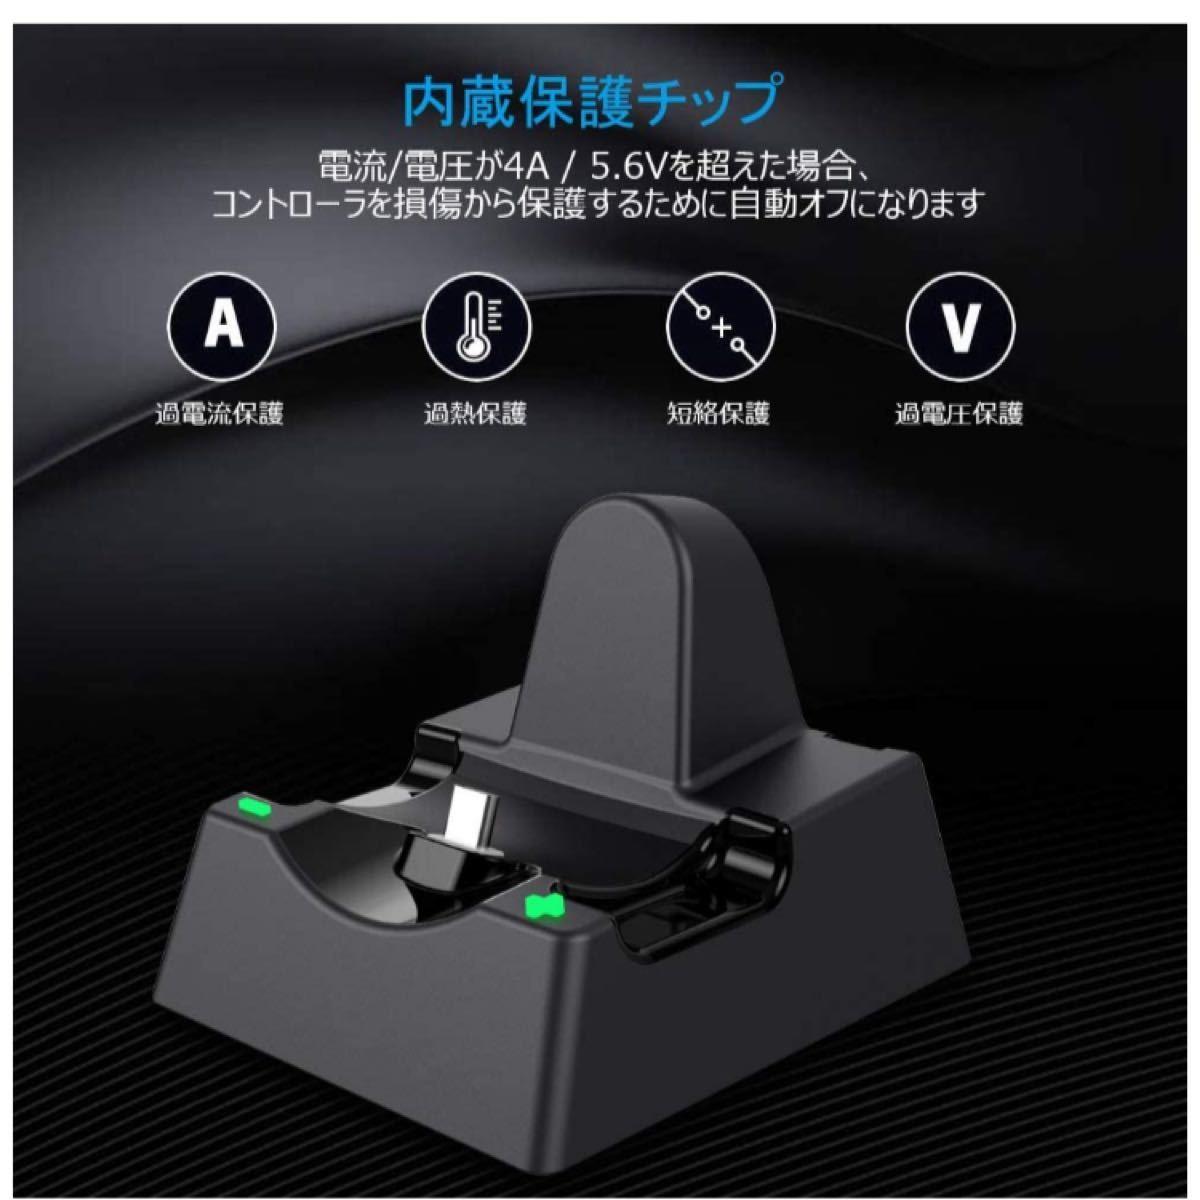 Nintendo switch ドック スイッチ 充電スタンド 2479